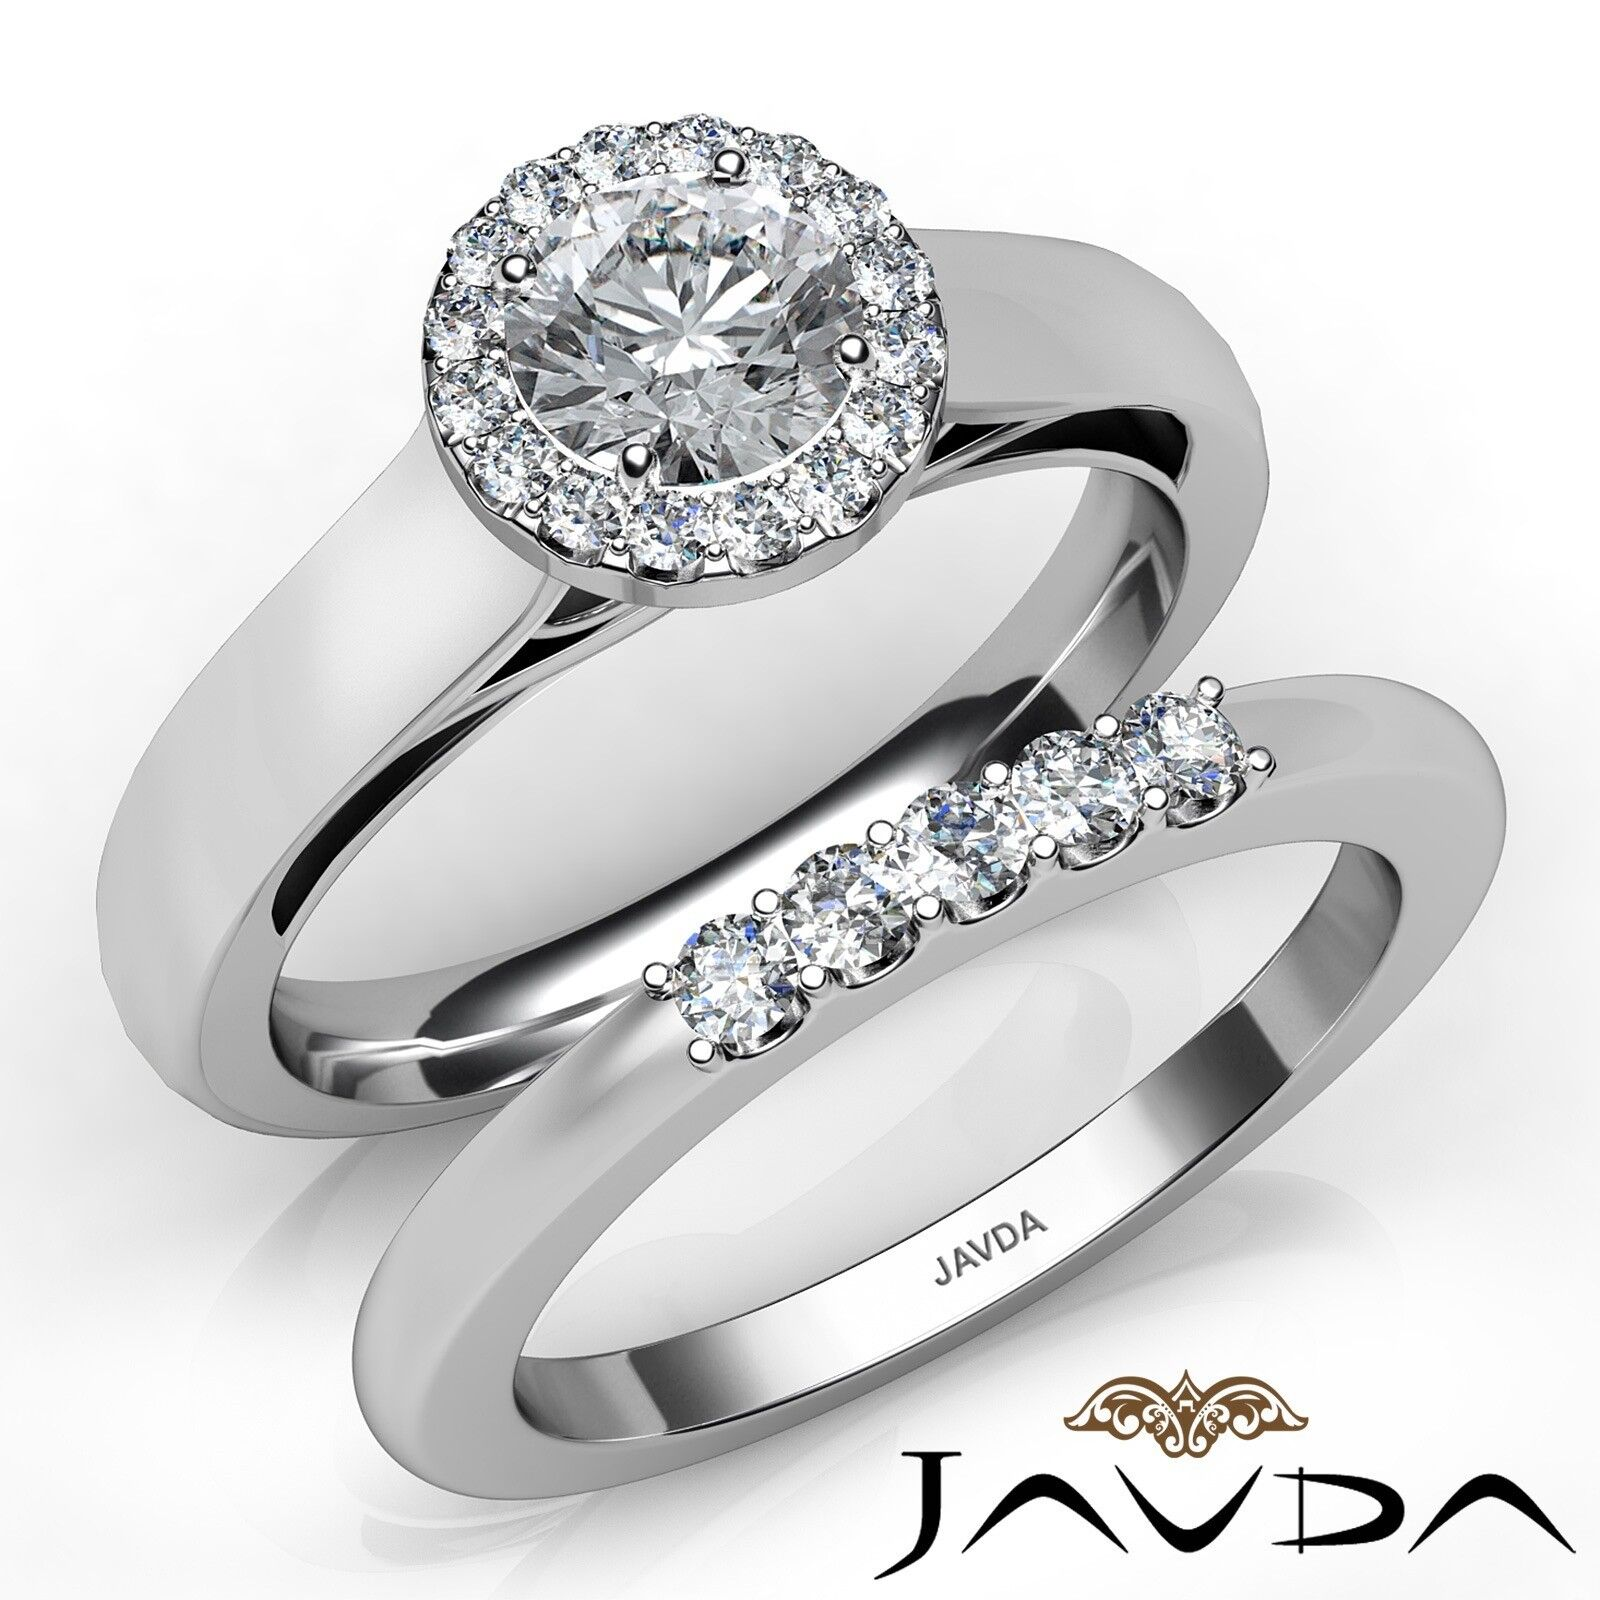 0.8ctw U Prong Halo Bridal Round Diamond Engagement Ring GIA H-VS2 White Gold